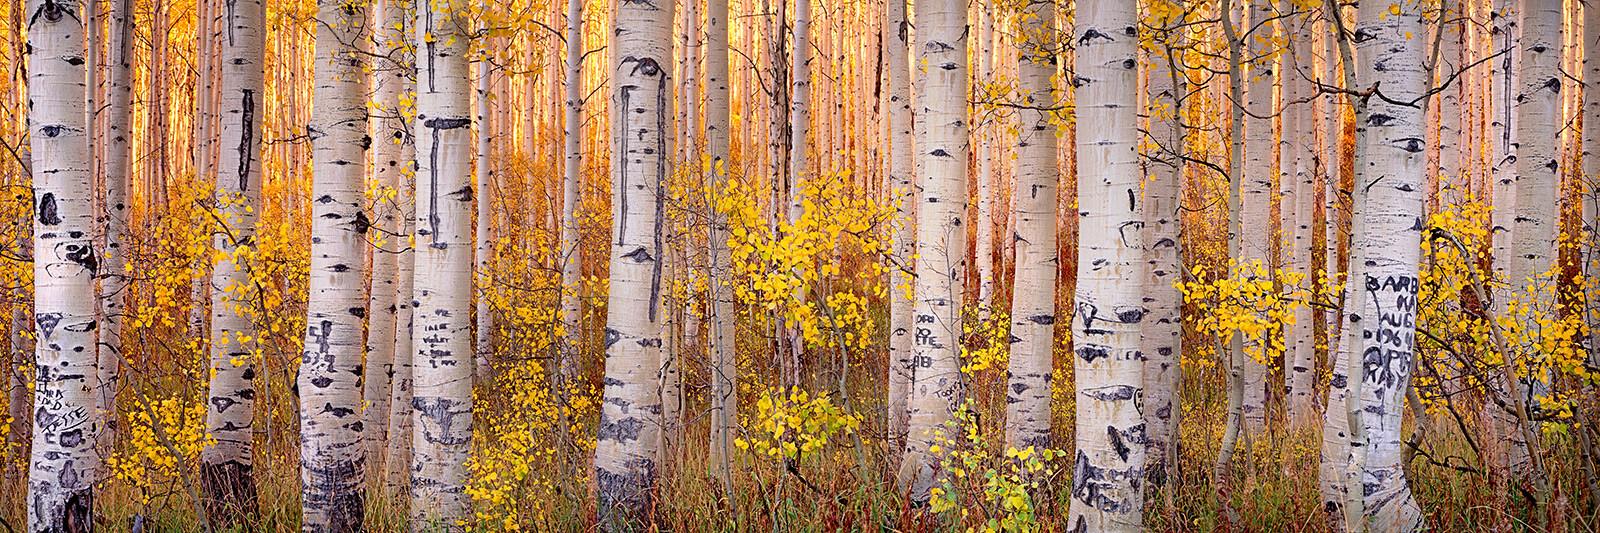 Forest Sunset - Steven Friedman